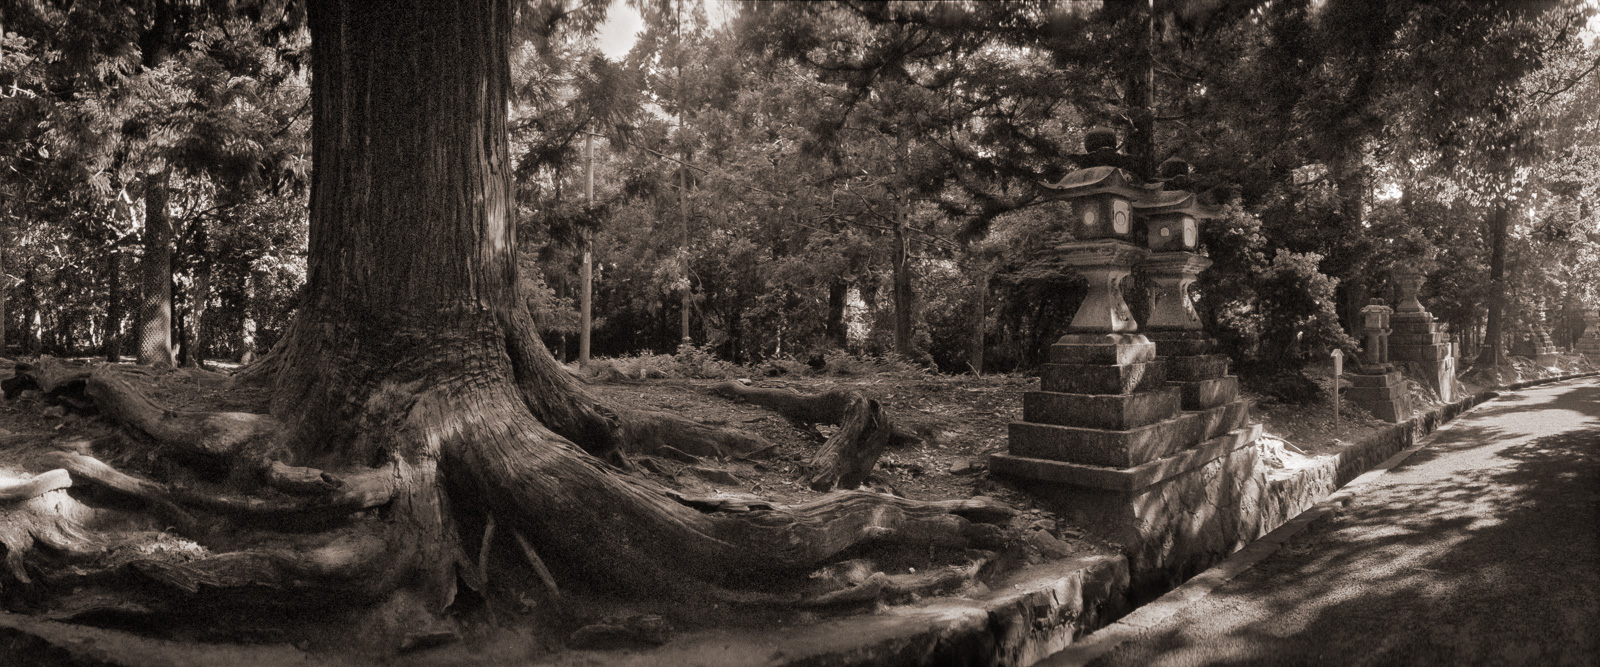 15-lanterns-and-tree-nara.jpg